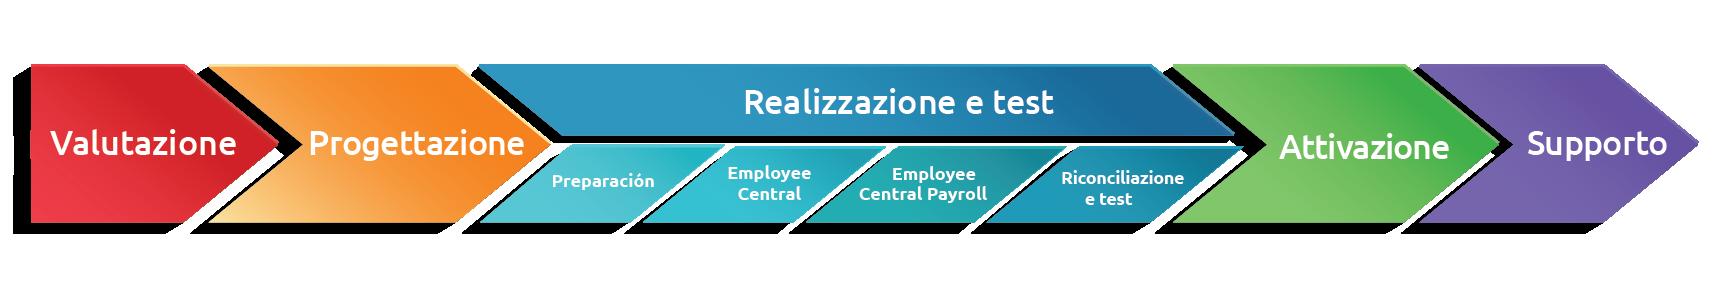 Chevron_Infographic_Italian_19_Nov